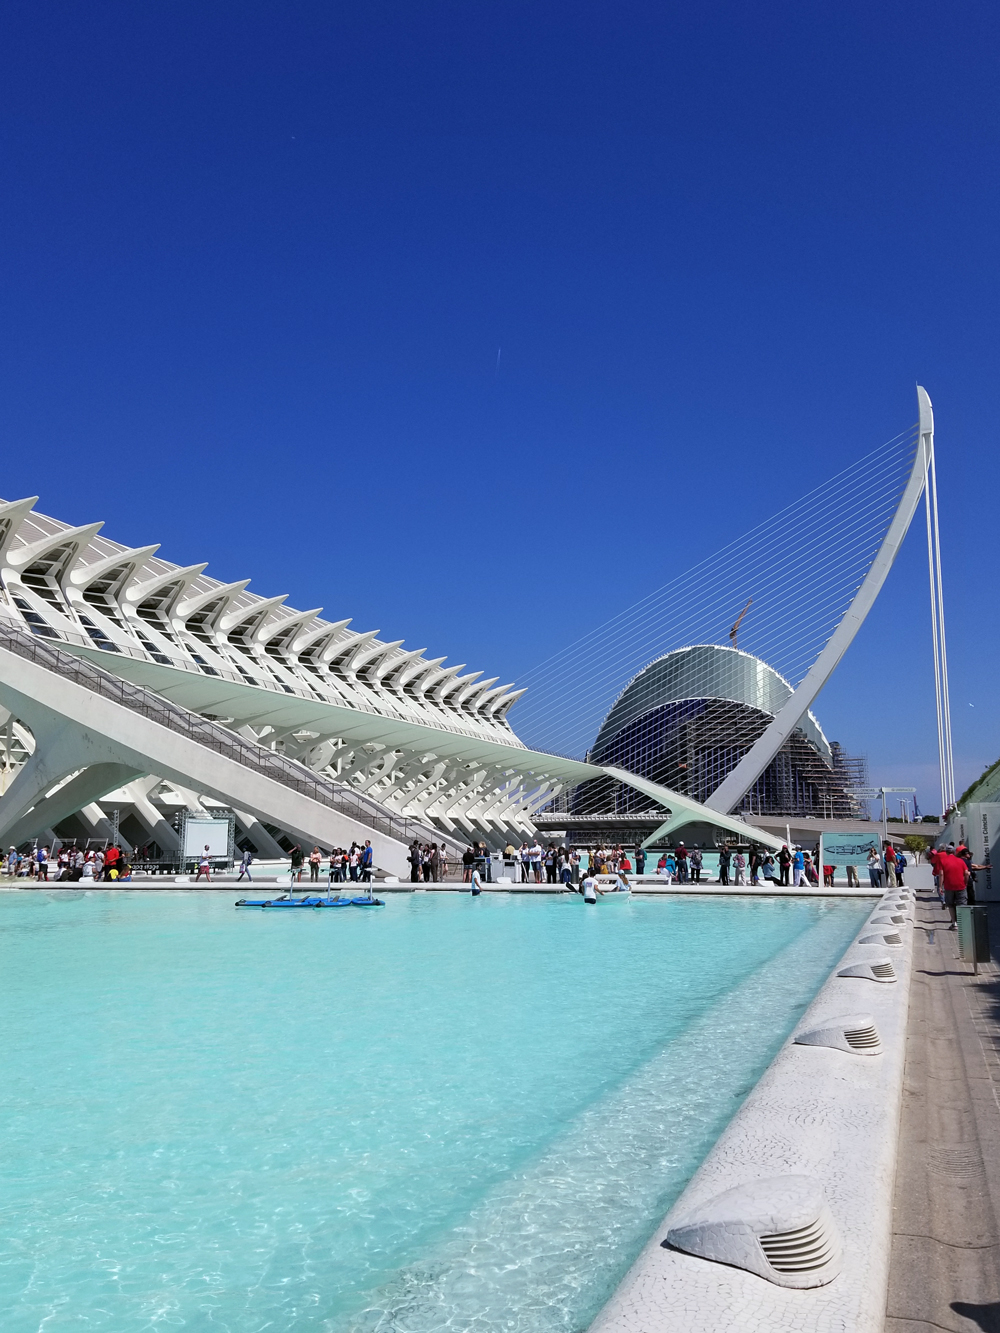 Spanish Wonder With Trafalgar